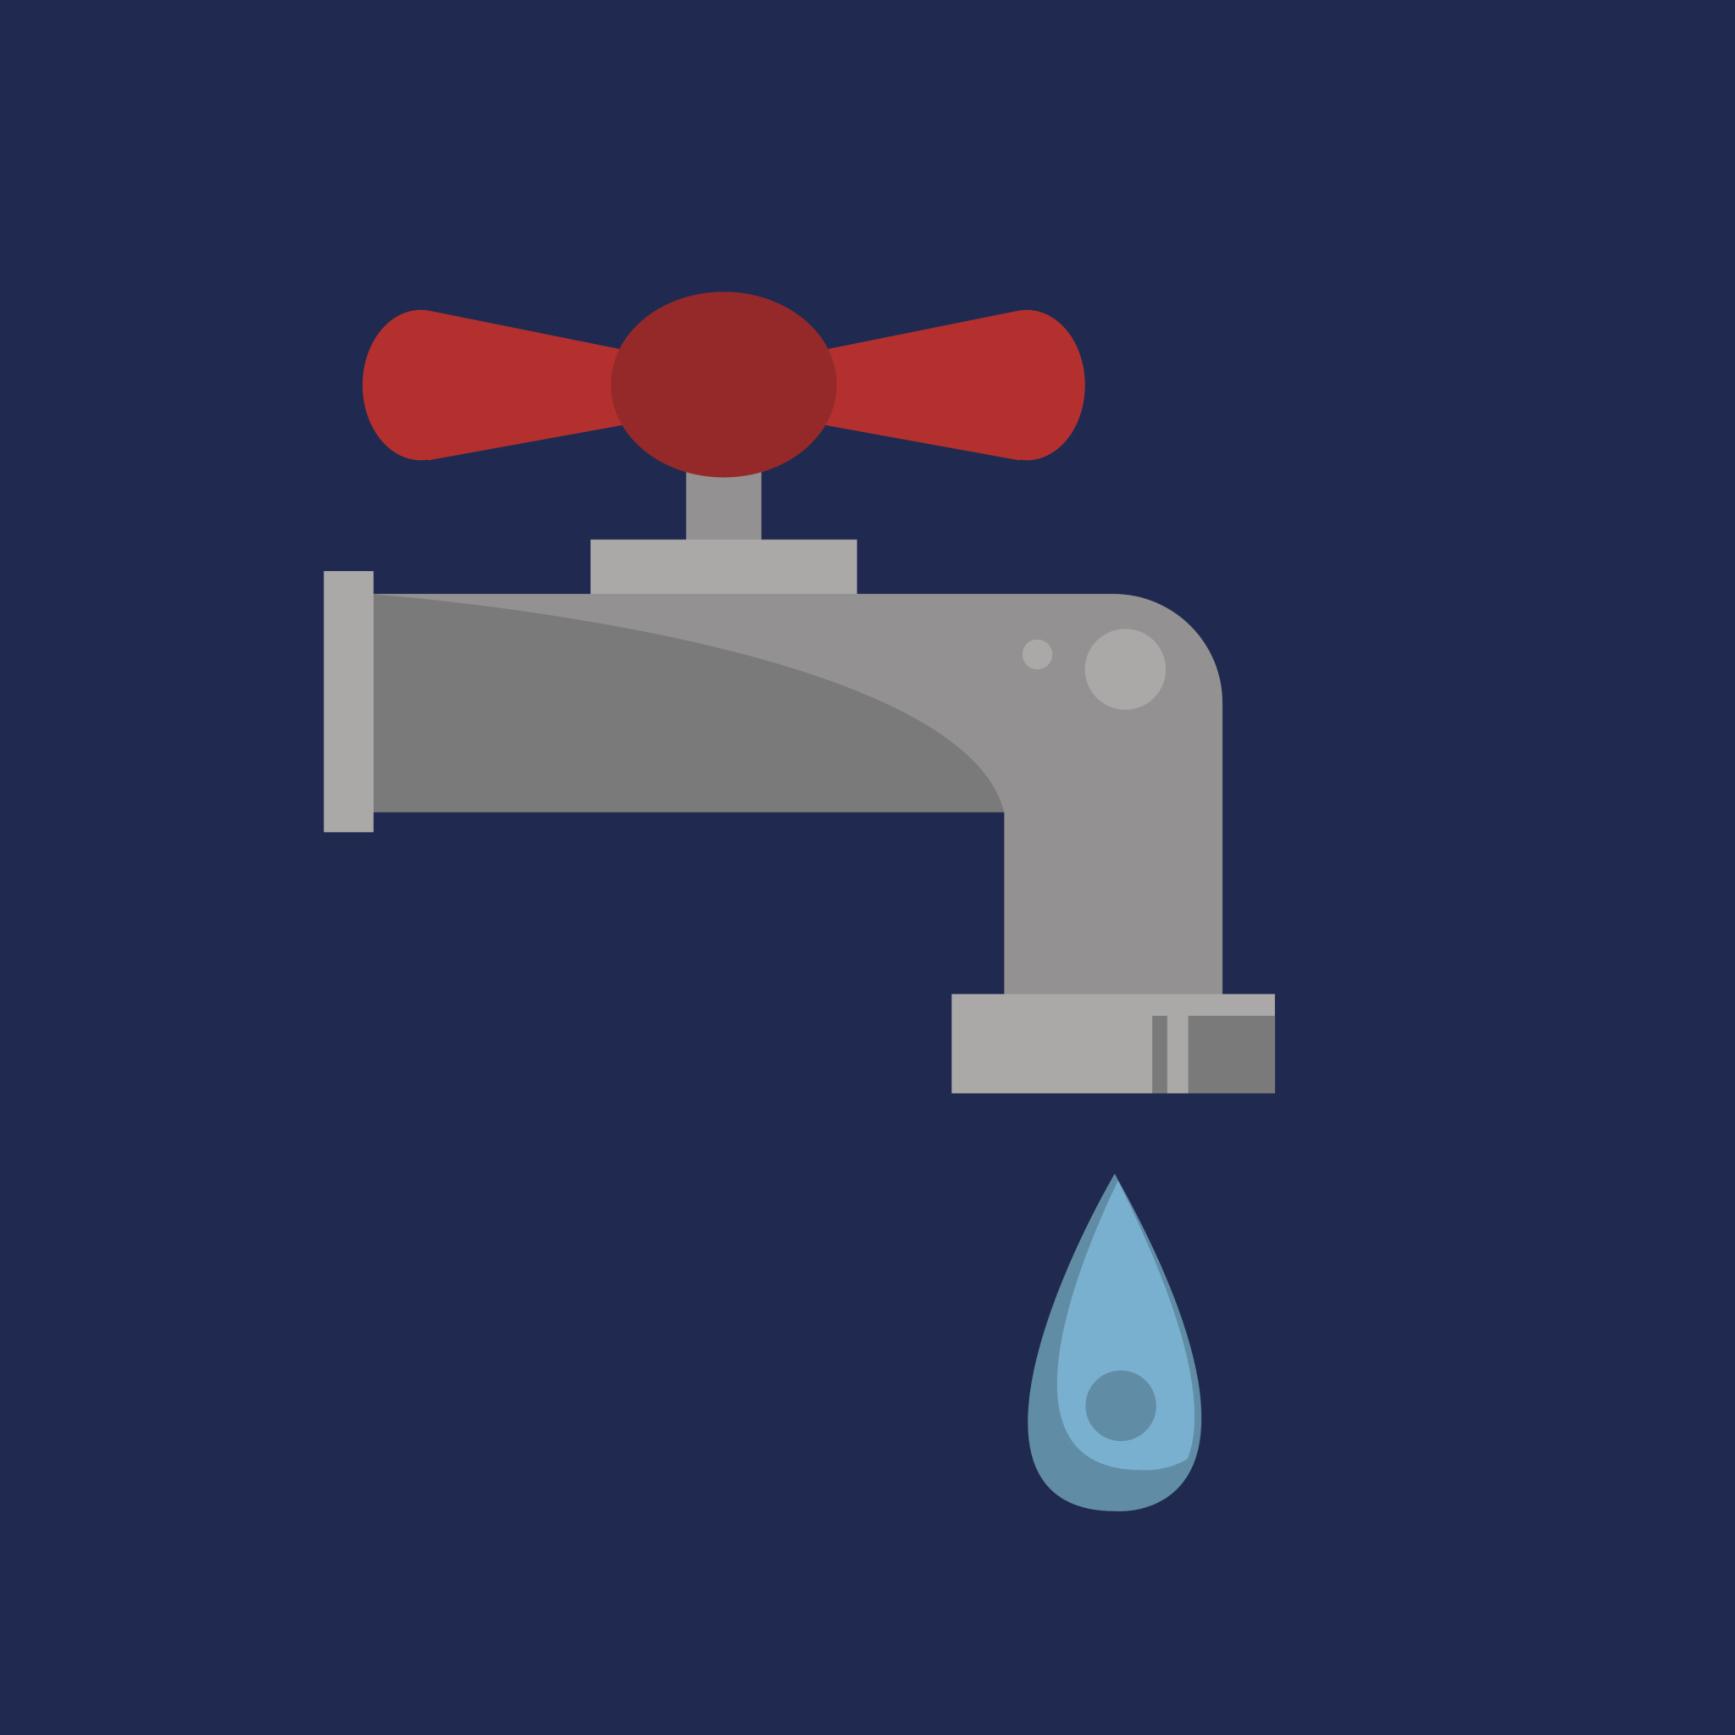 Water-faucet-drought.jpg